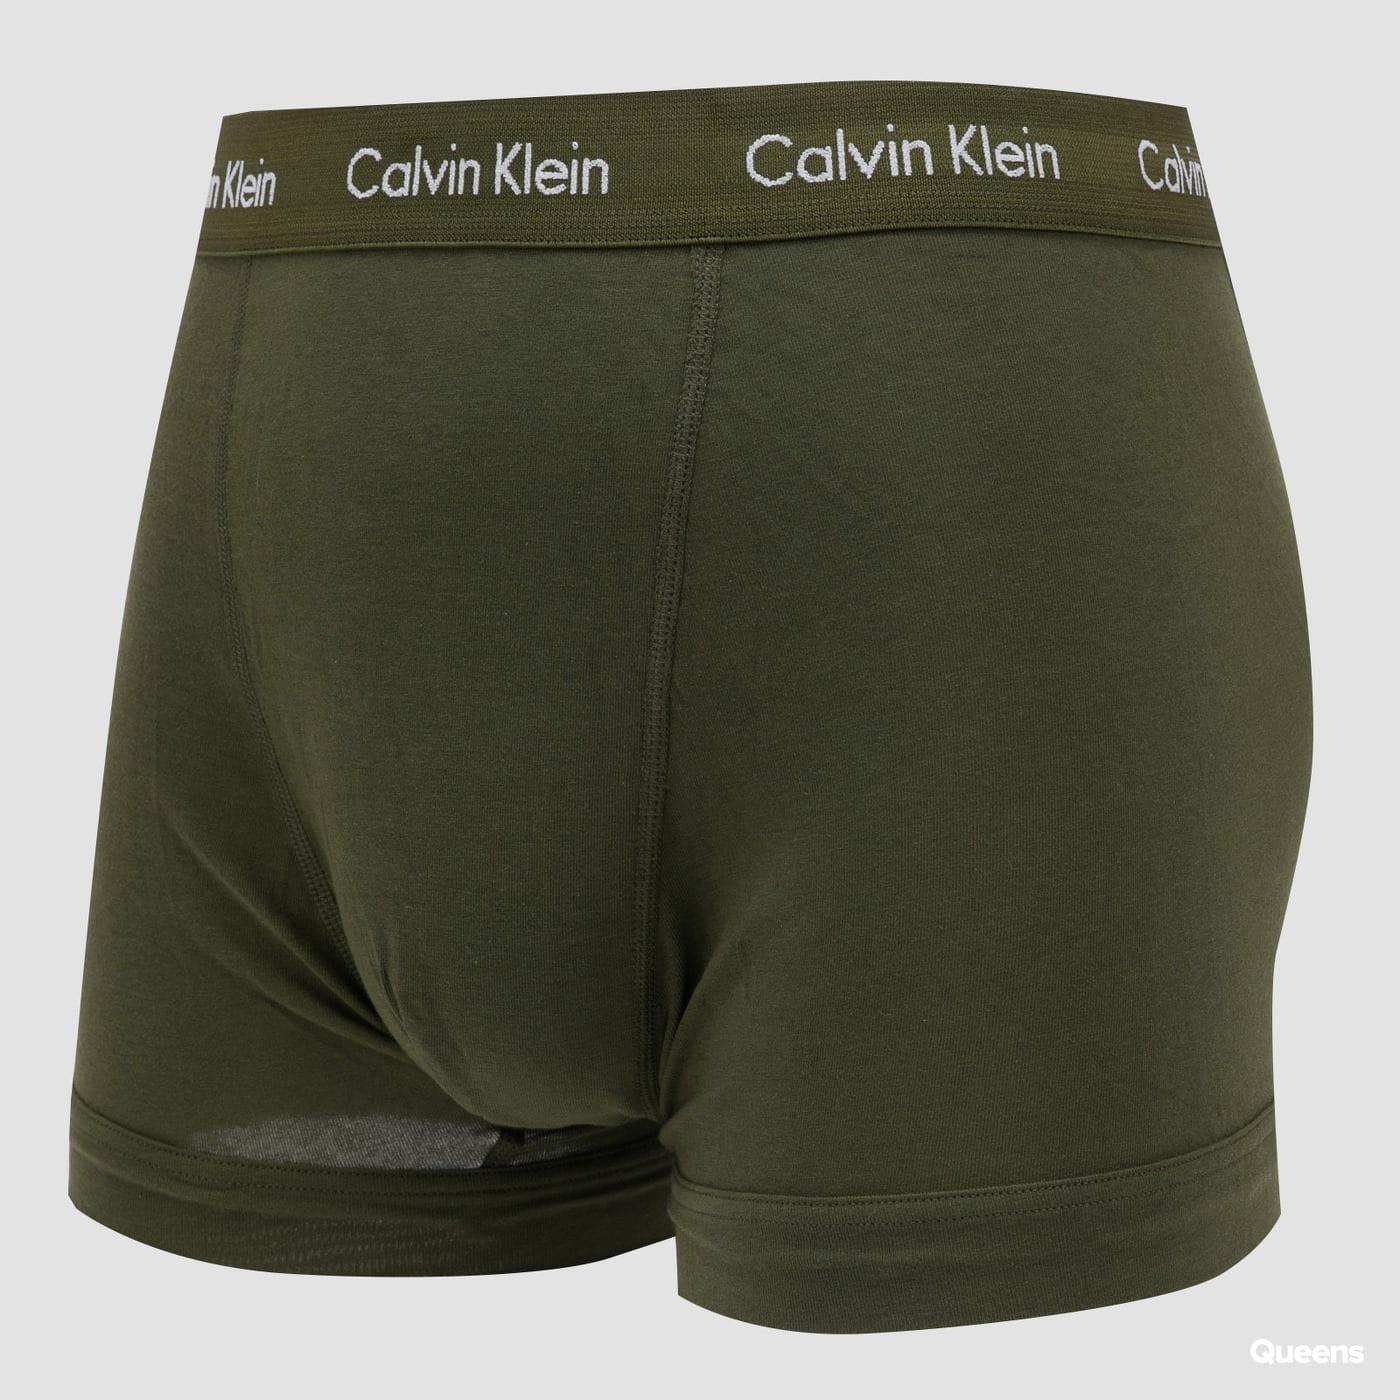 Calvin Klein 3Pack Trunks Cotton Stretch olive / light blue / black